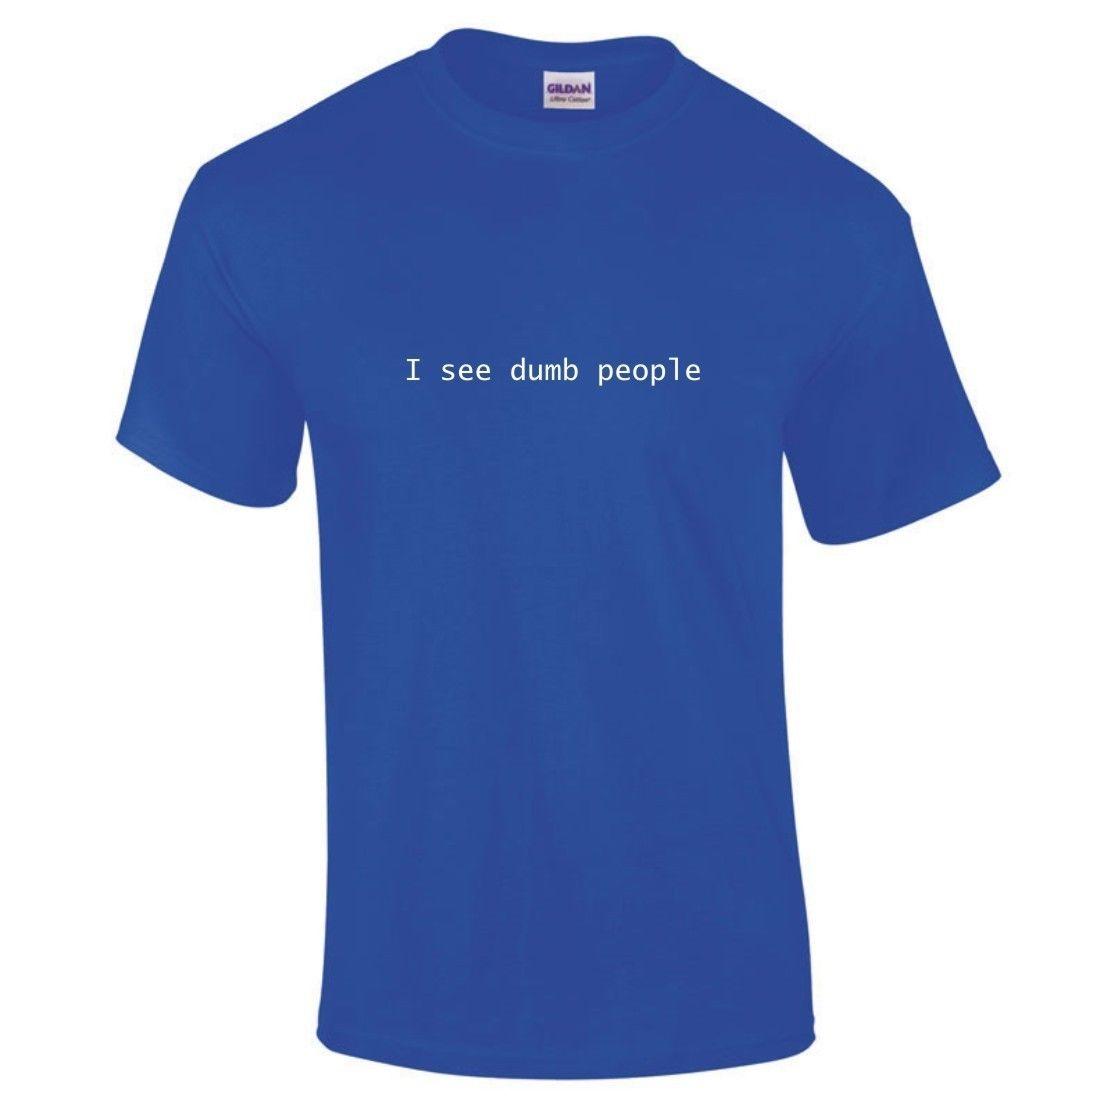 I See Dumb People Sixth Sense Parody BREXIT Remain EU Vote Funny T Shirt New T Shirts Funny Tops Tee New Unisex Funny Tops in T Shirts from Men 39 s Clothing